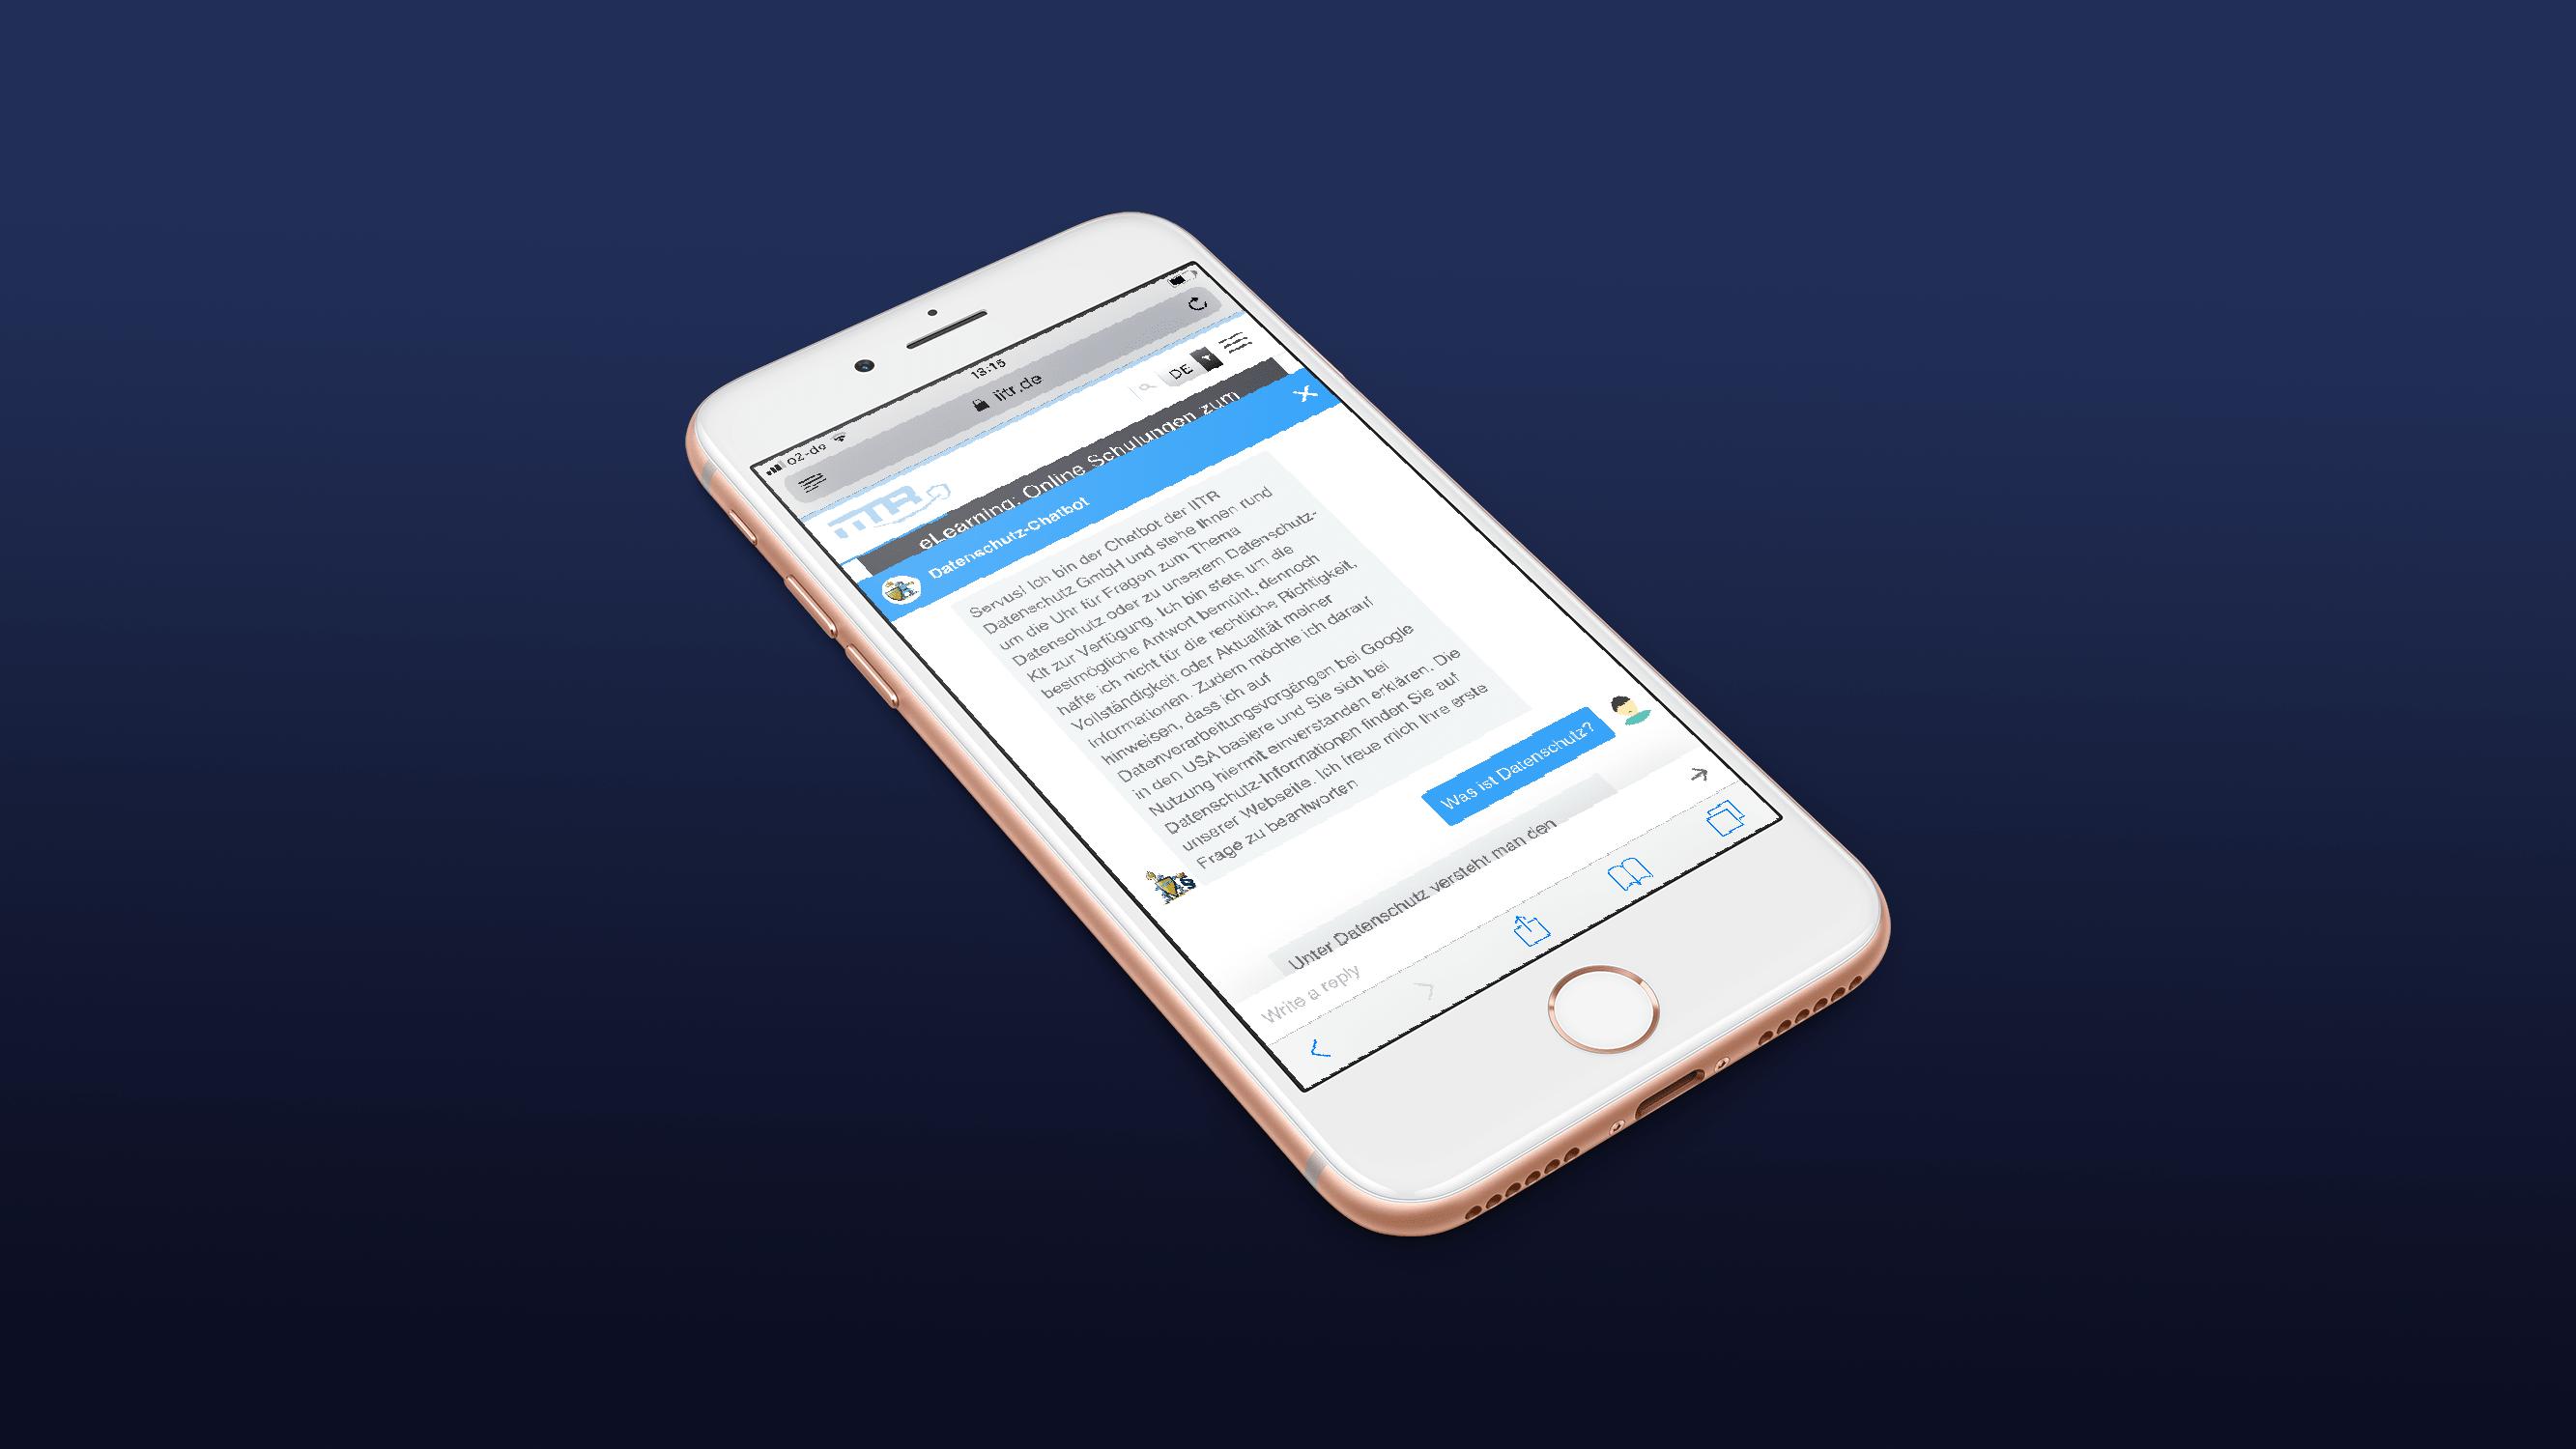 IITR Datenschutz Chatbot